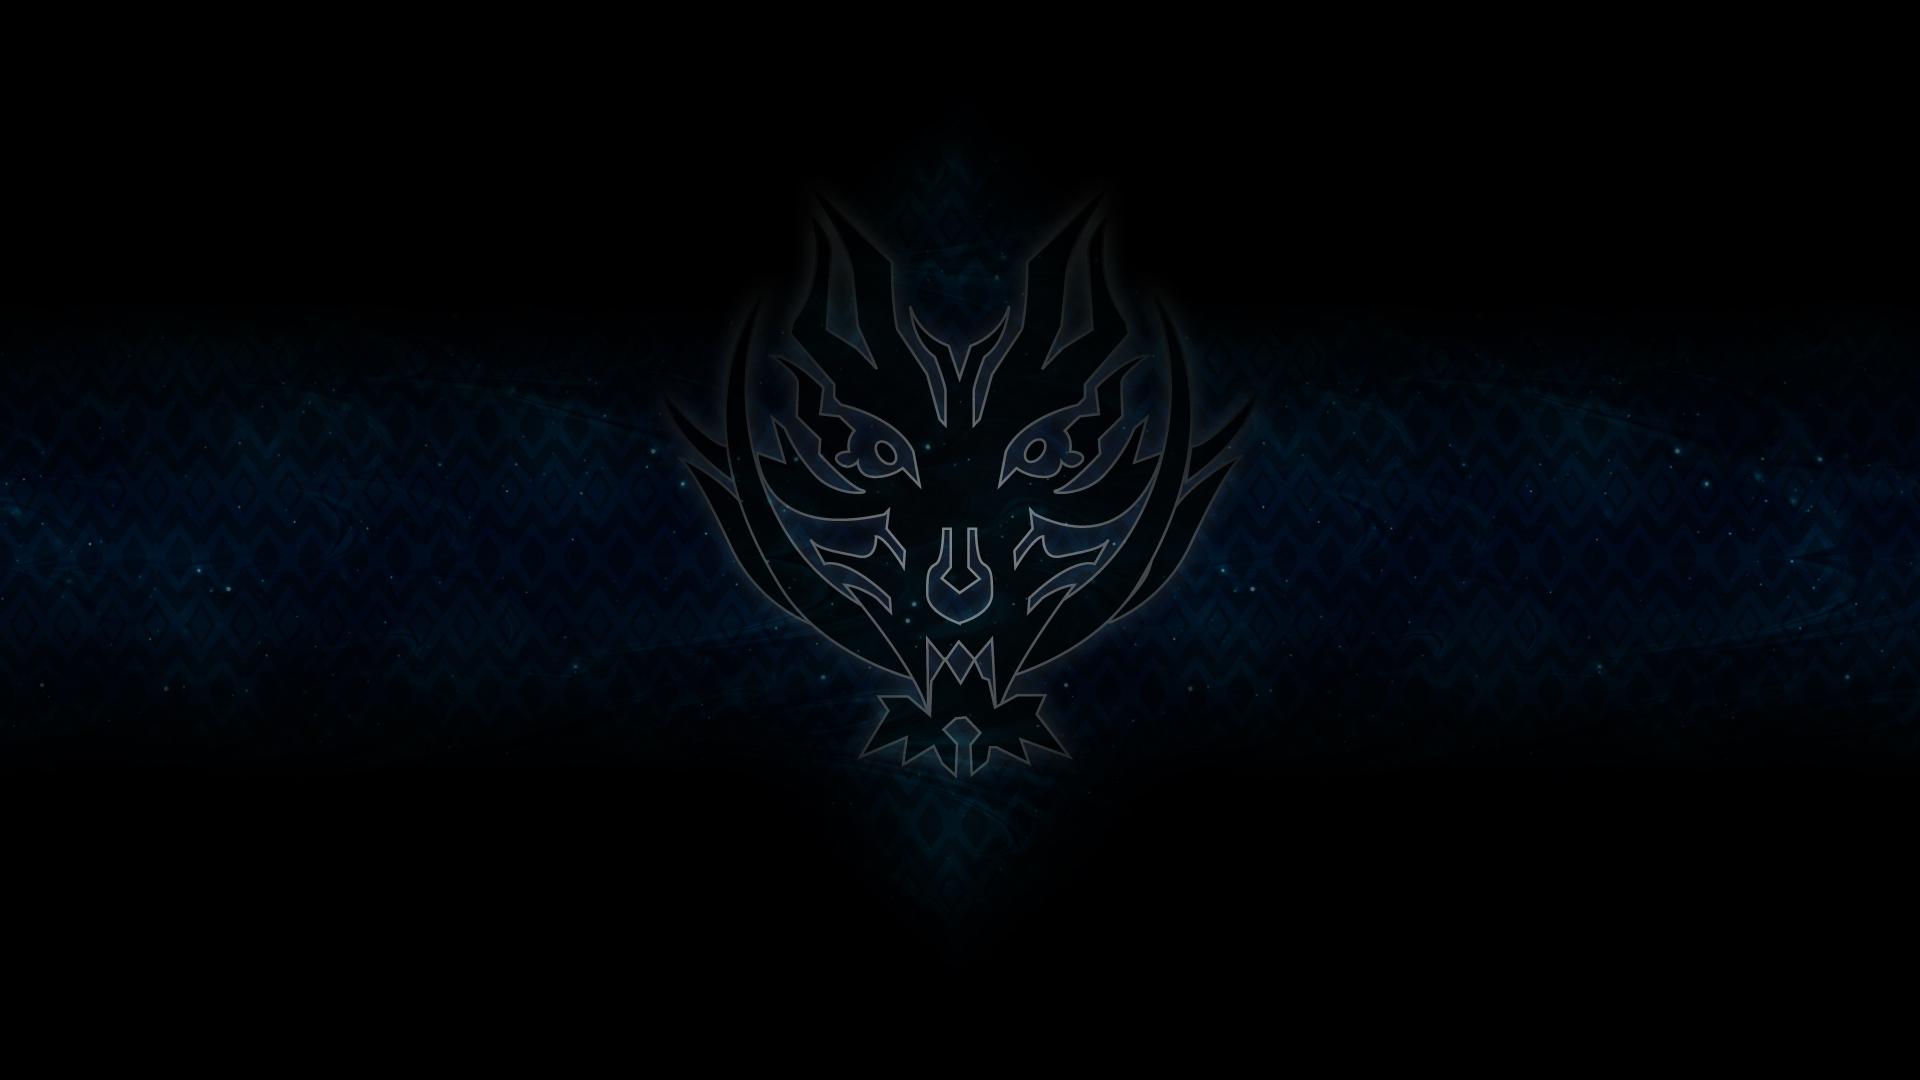 Free Download Dragon Logo Wallpaper For Computer 9439